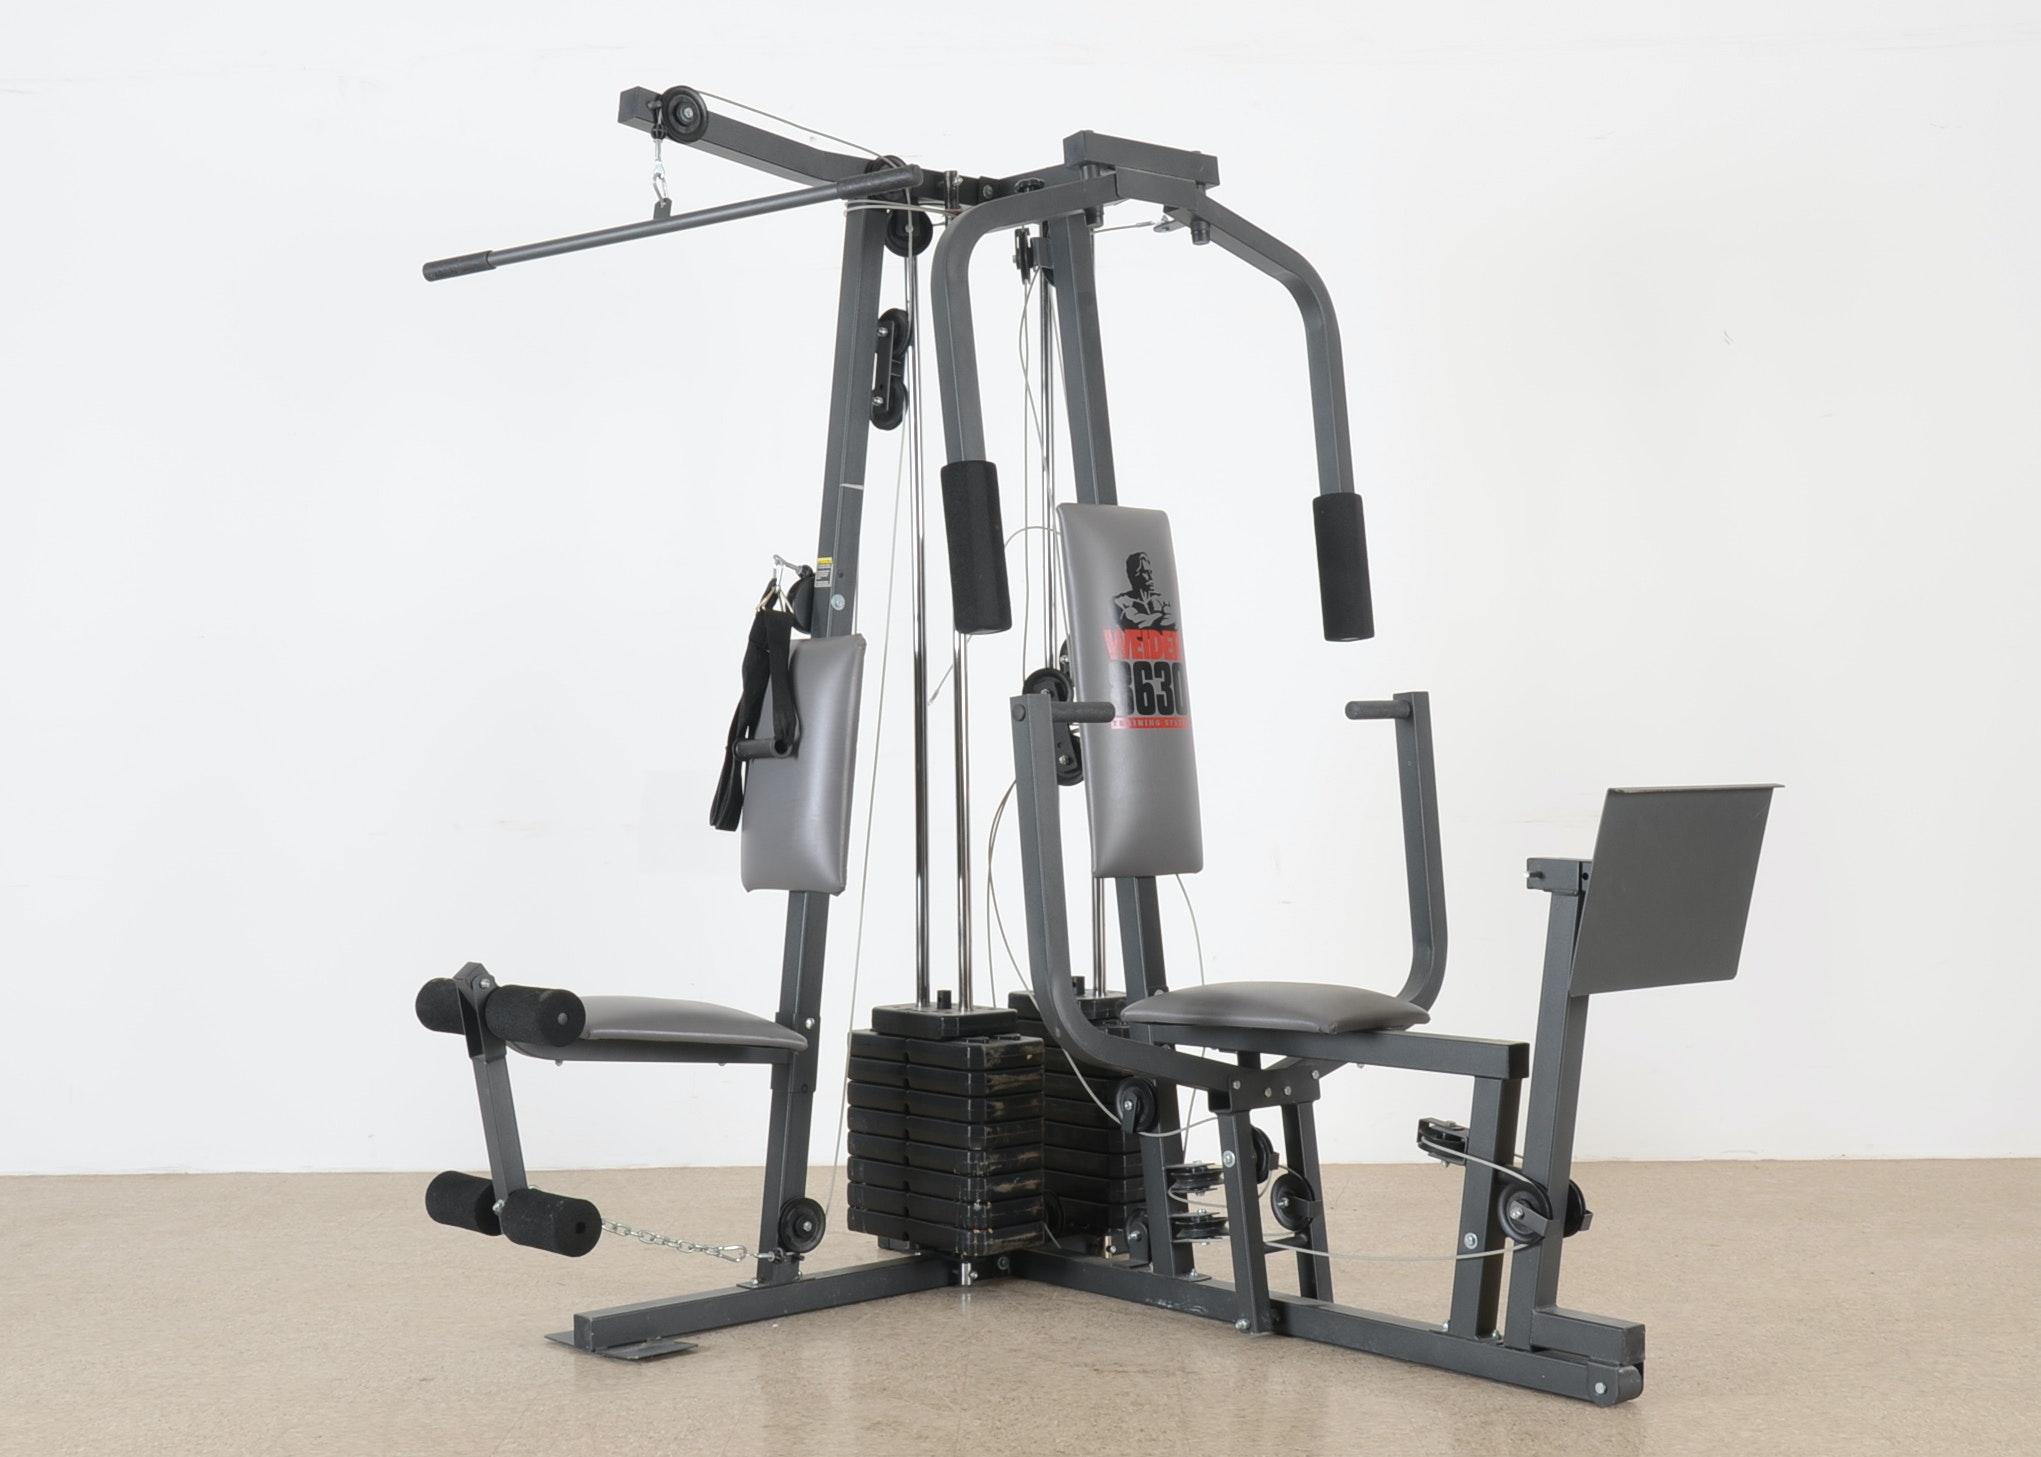 Weider 8630 Training System Home Gym